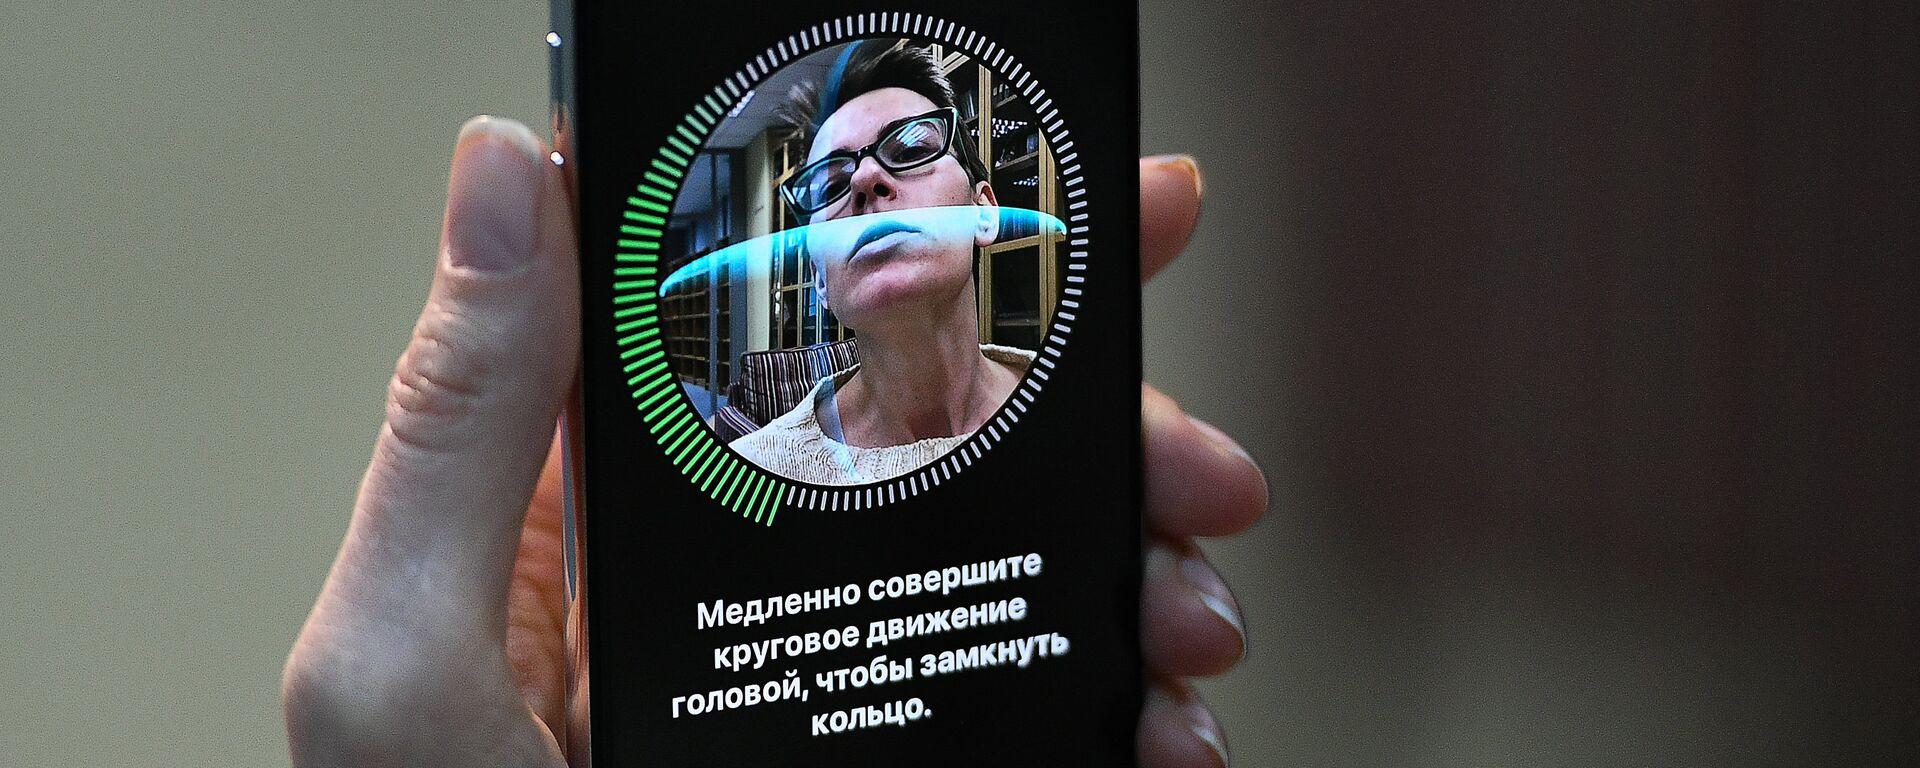 iPhone X - Sputnik Латвия, 1920, 17.08.2018